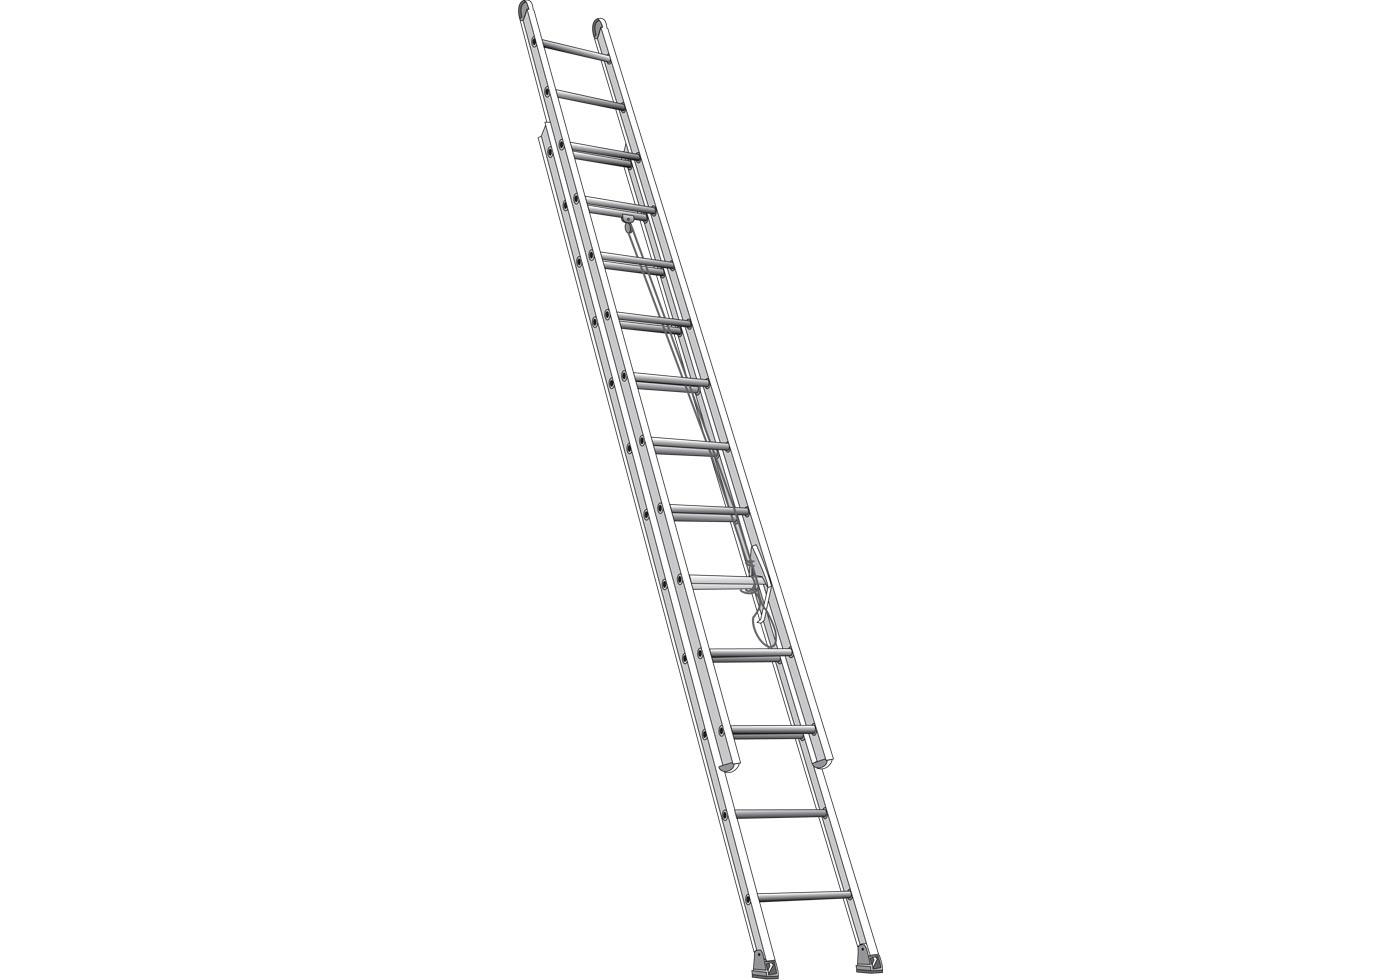 Free Vector Extending Ladder Illustration